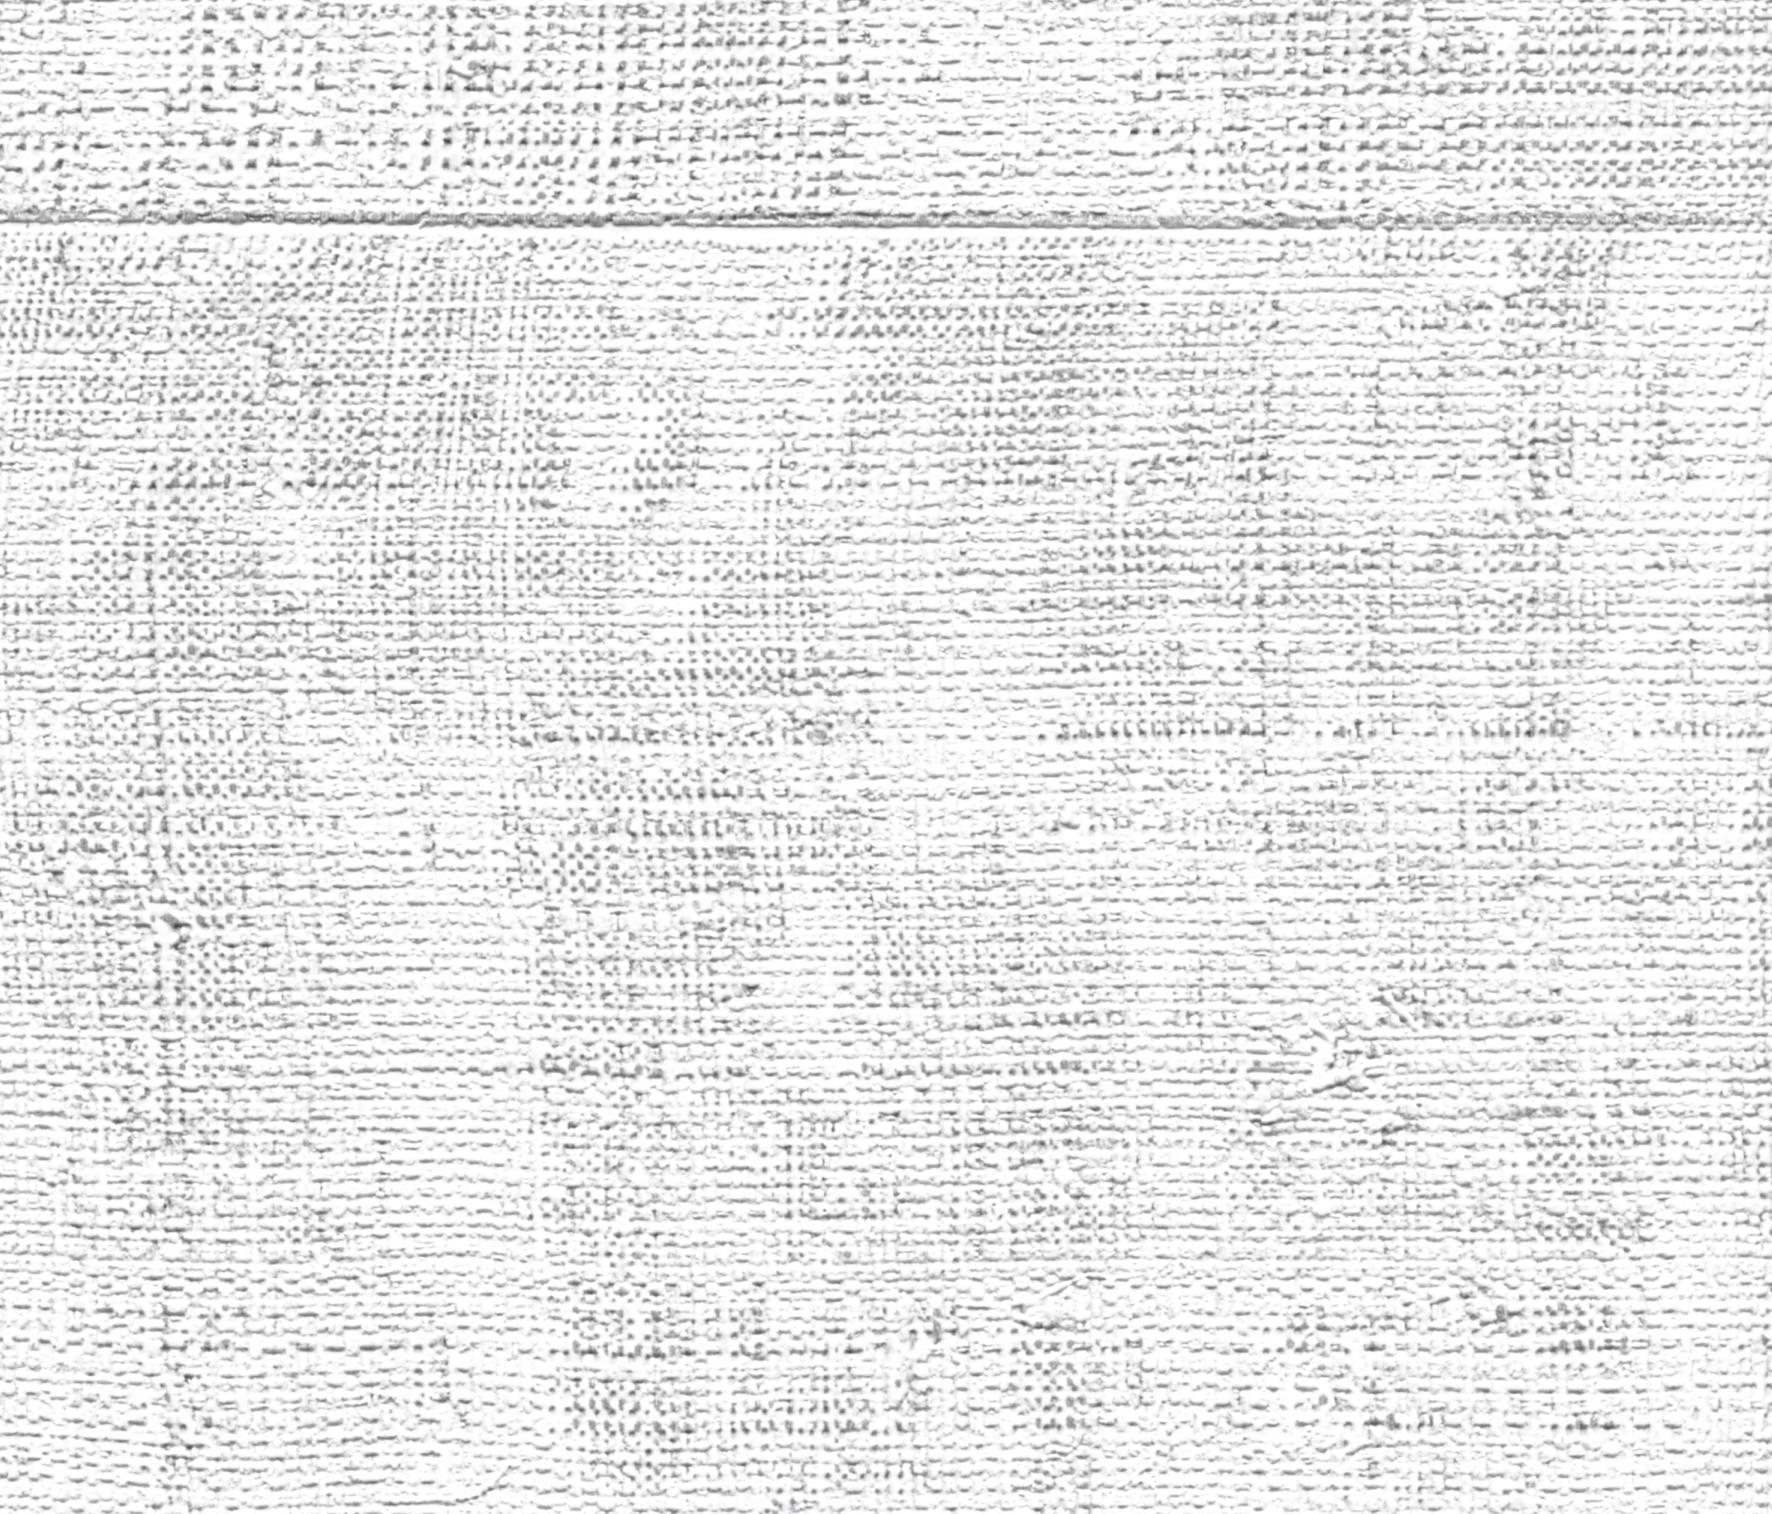 Eldorado Atelier D Artiste Vp 880 01 Revetements Muraux